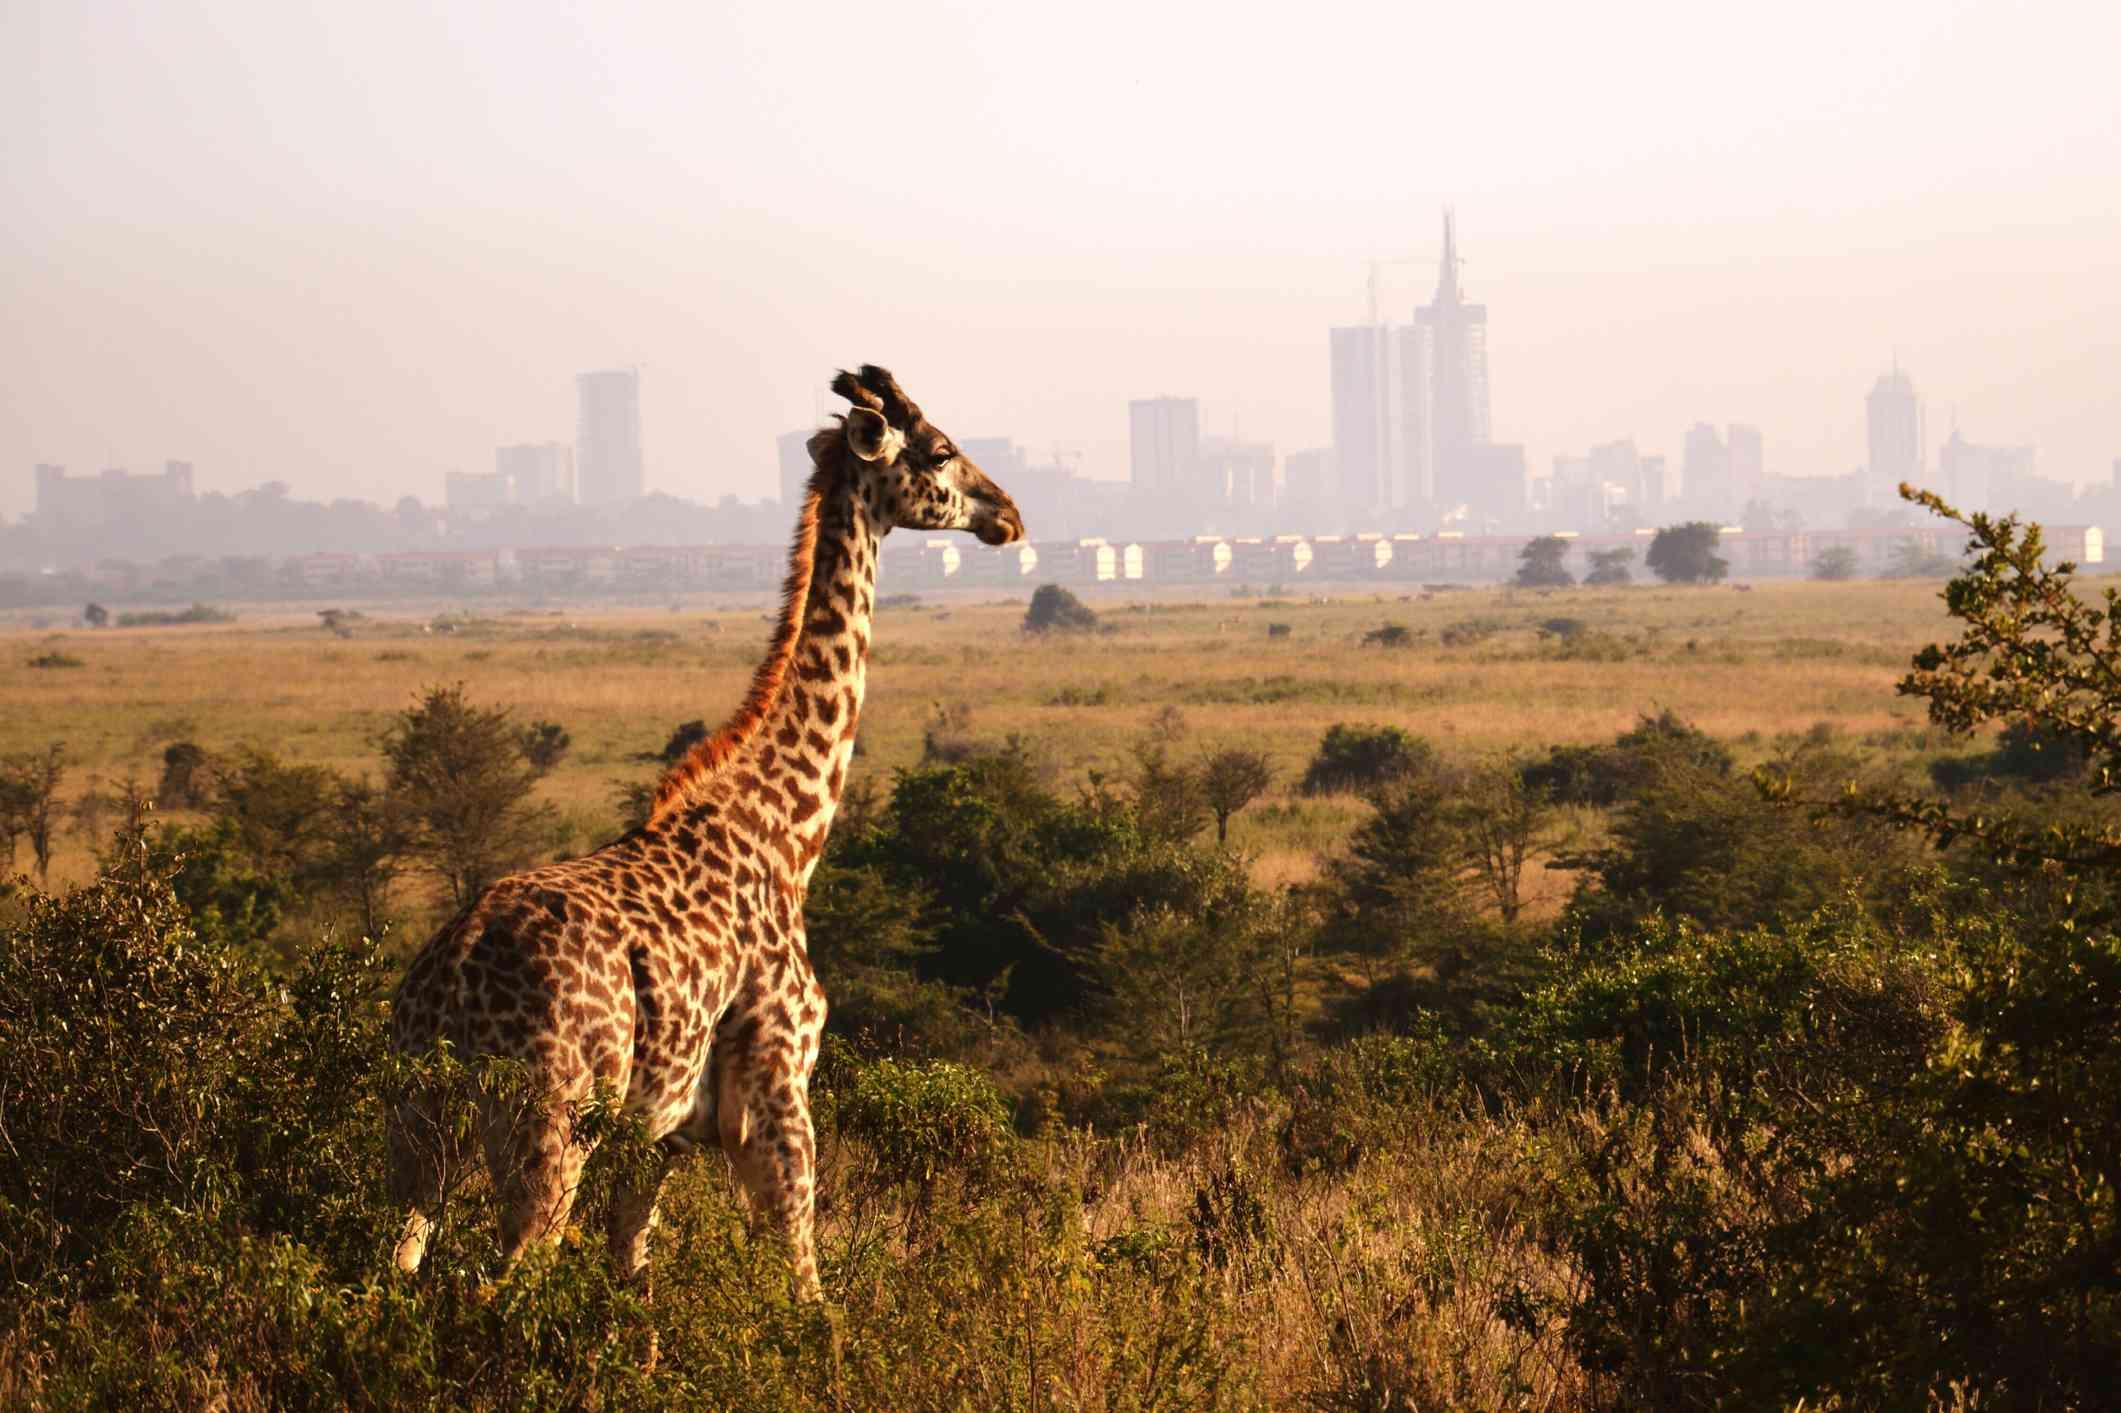 Giraffe standing against a city backdrop in Nairobi National Park